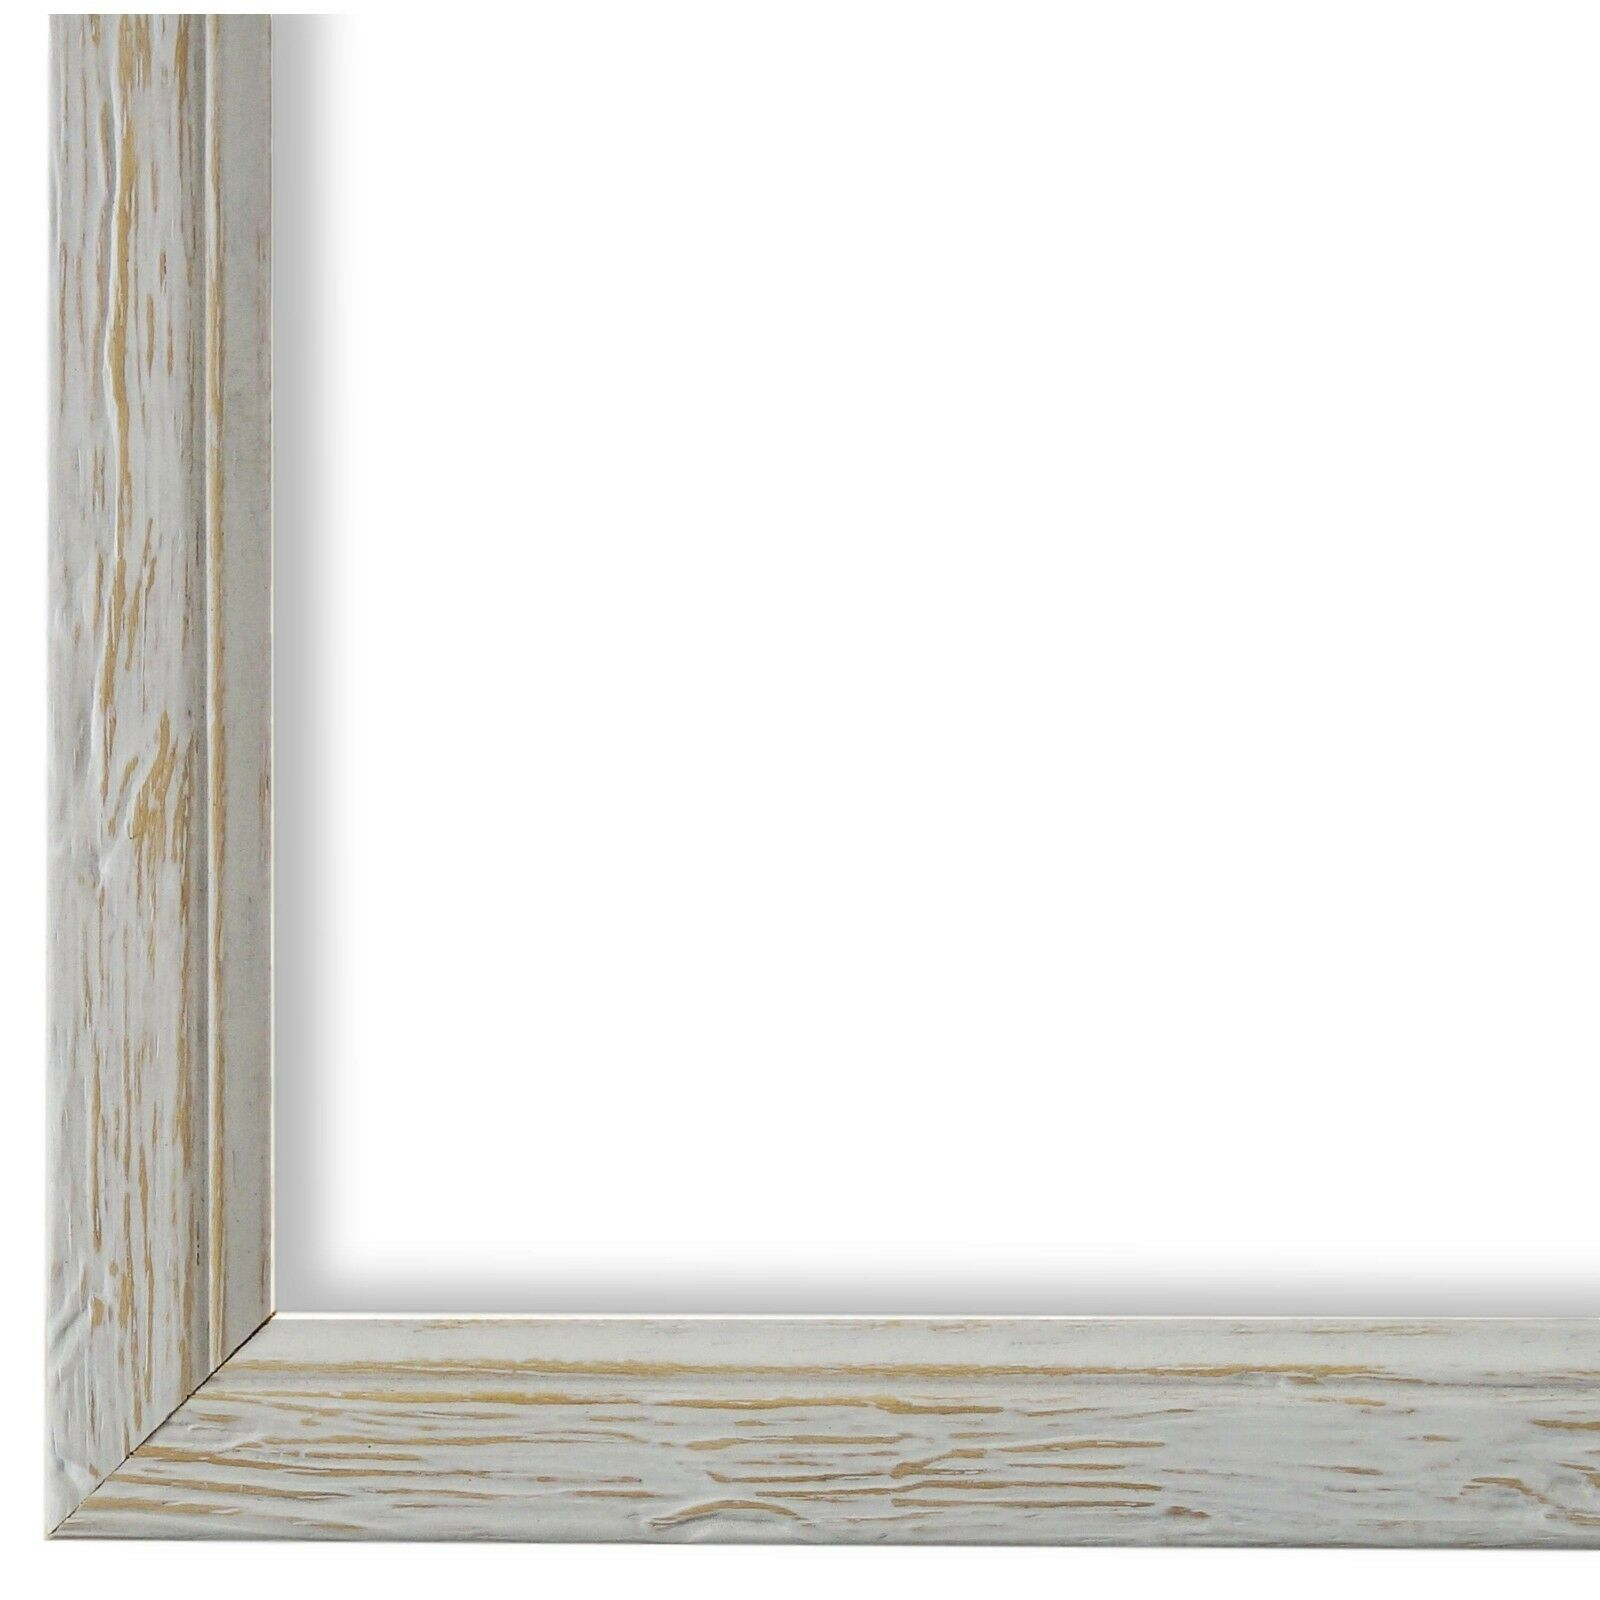 Cadre photo marron bois Pinerolo 2,3-24x30 28x35 30x30 30x40 30x45 40x40 40x50